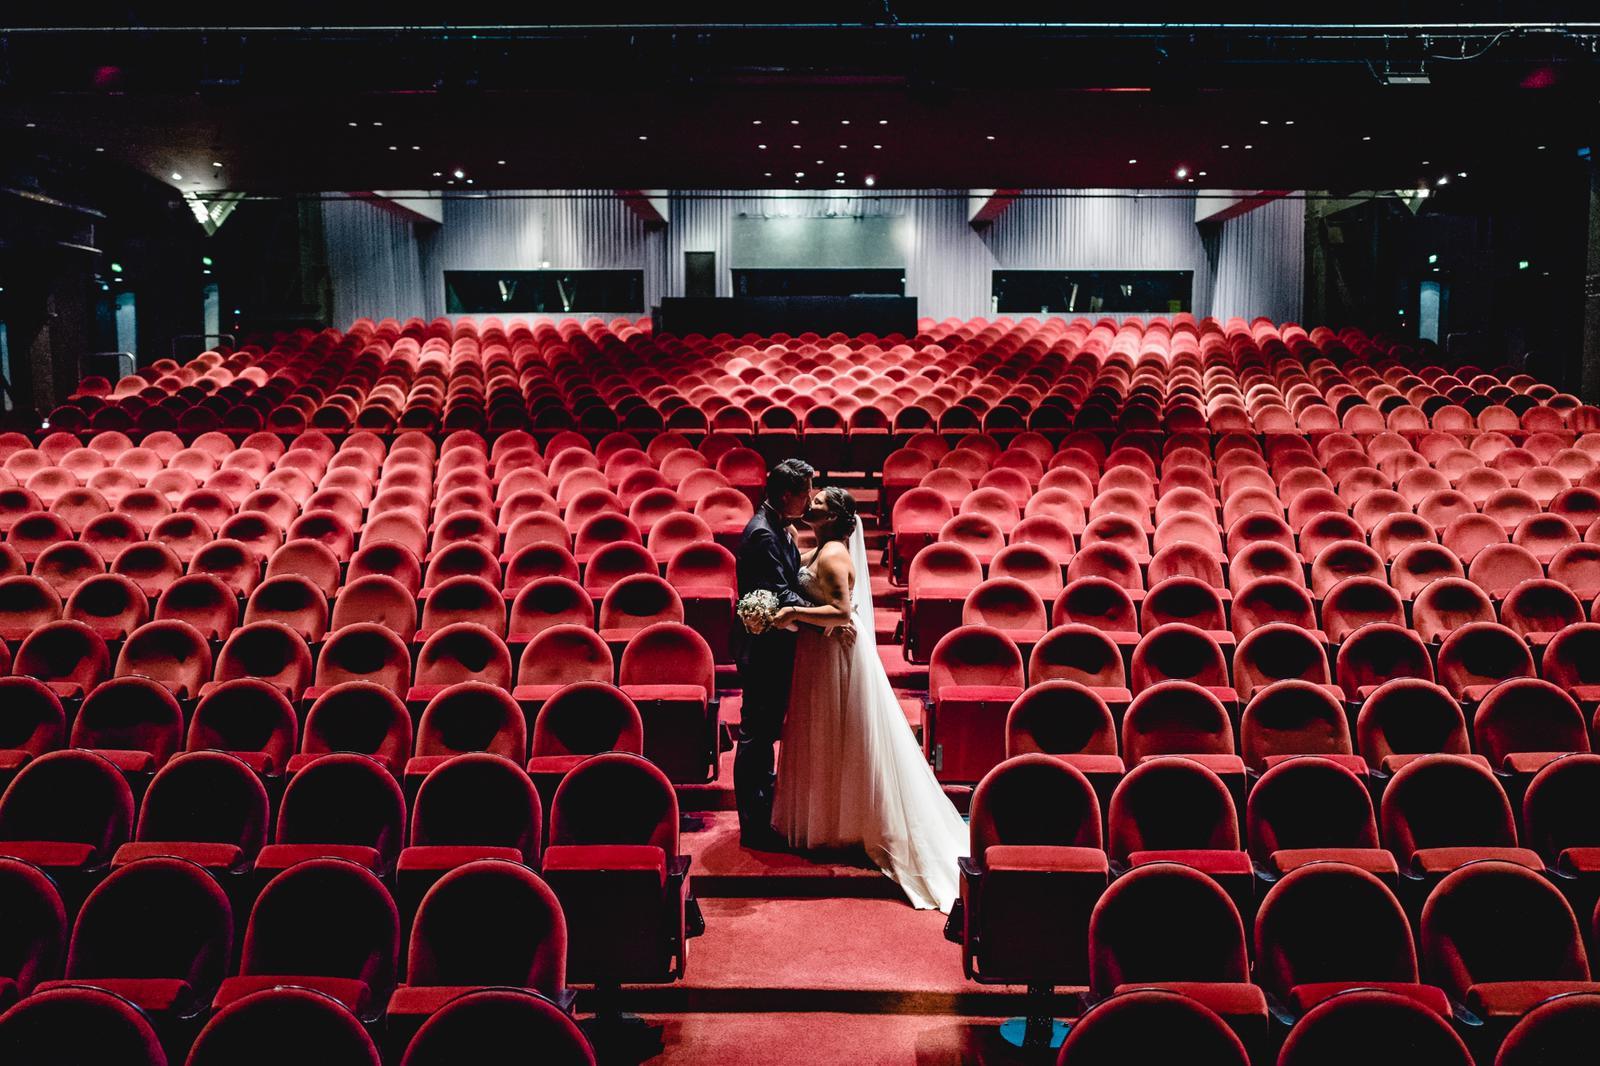 Allein im Theatersaal